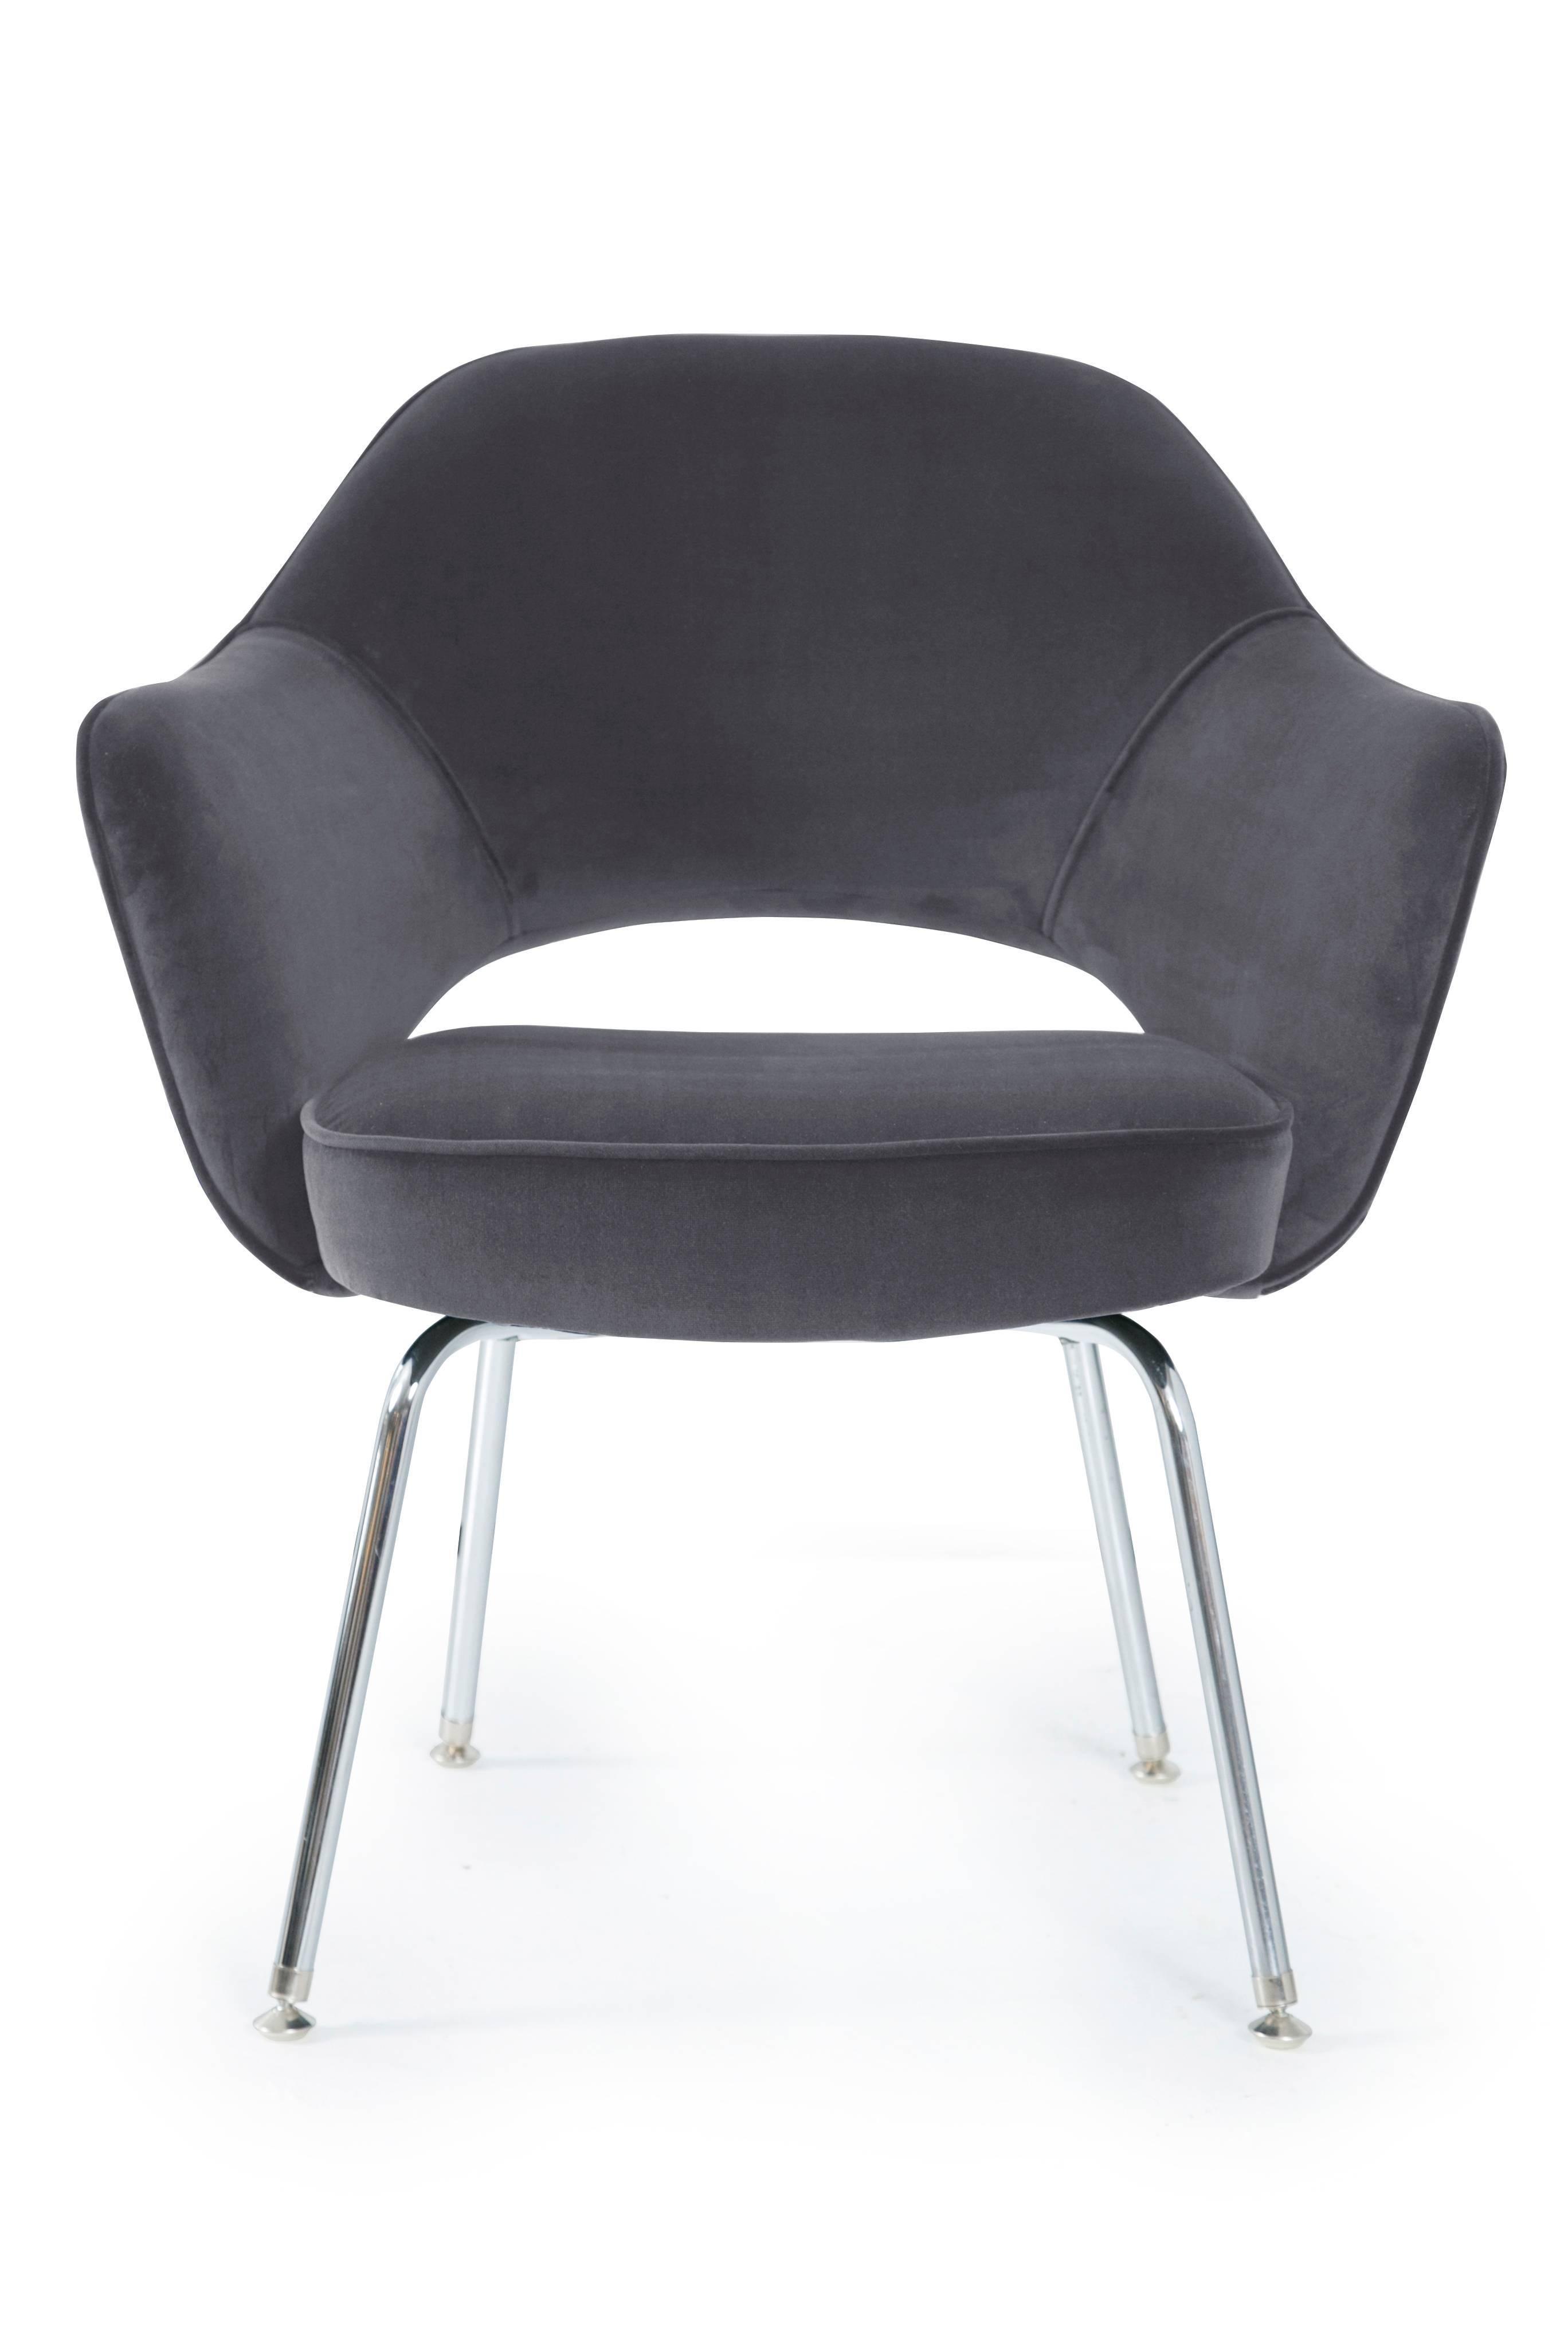 Saarinen Executive Arm Chairs In Gunmetal Velvet For Sale At 1stdibs